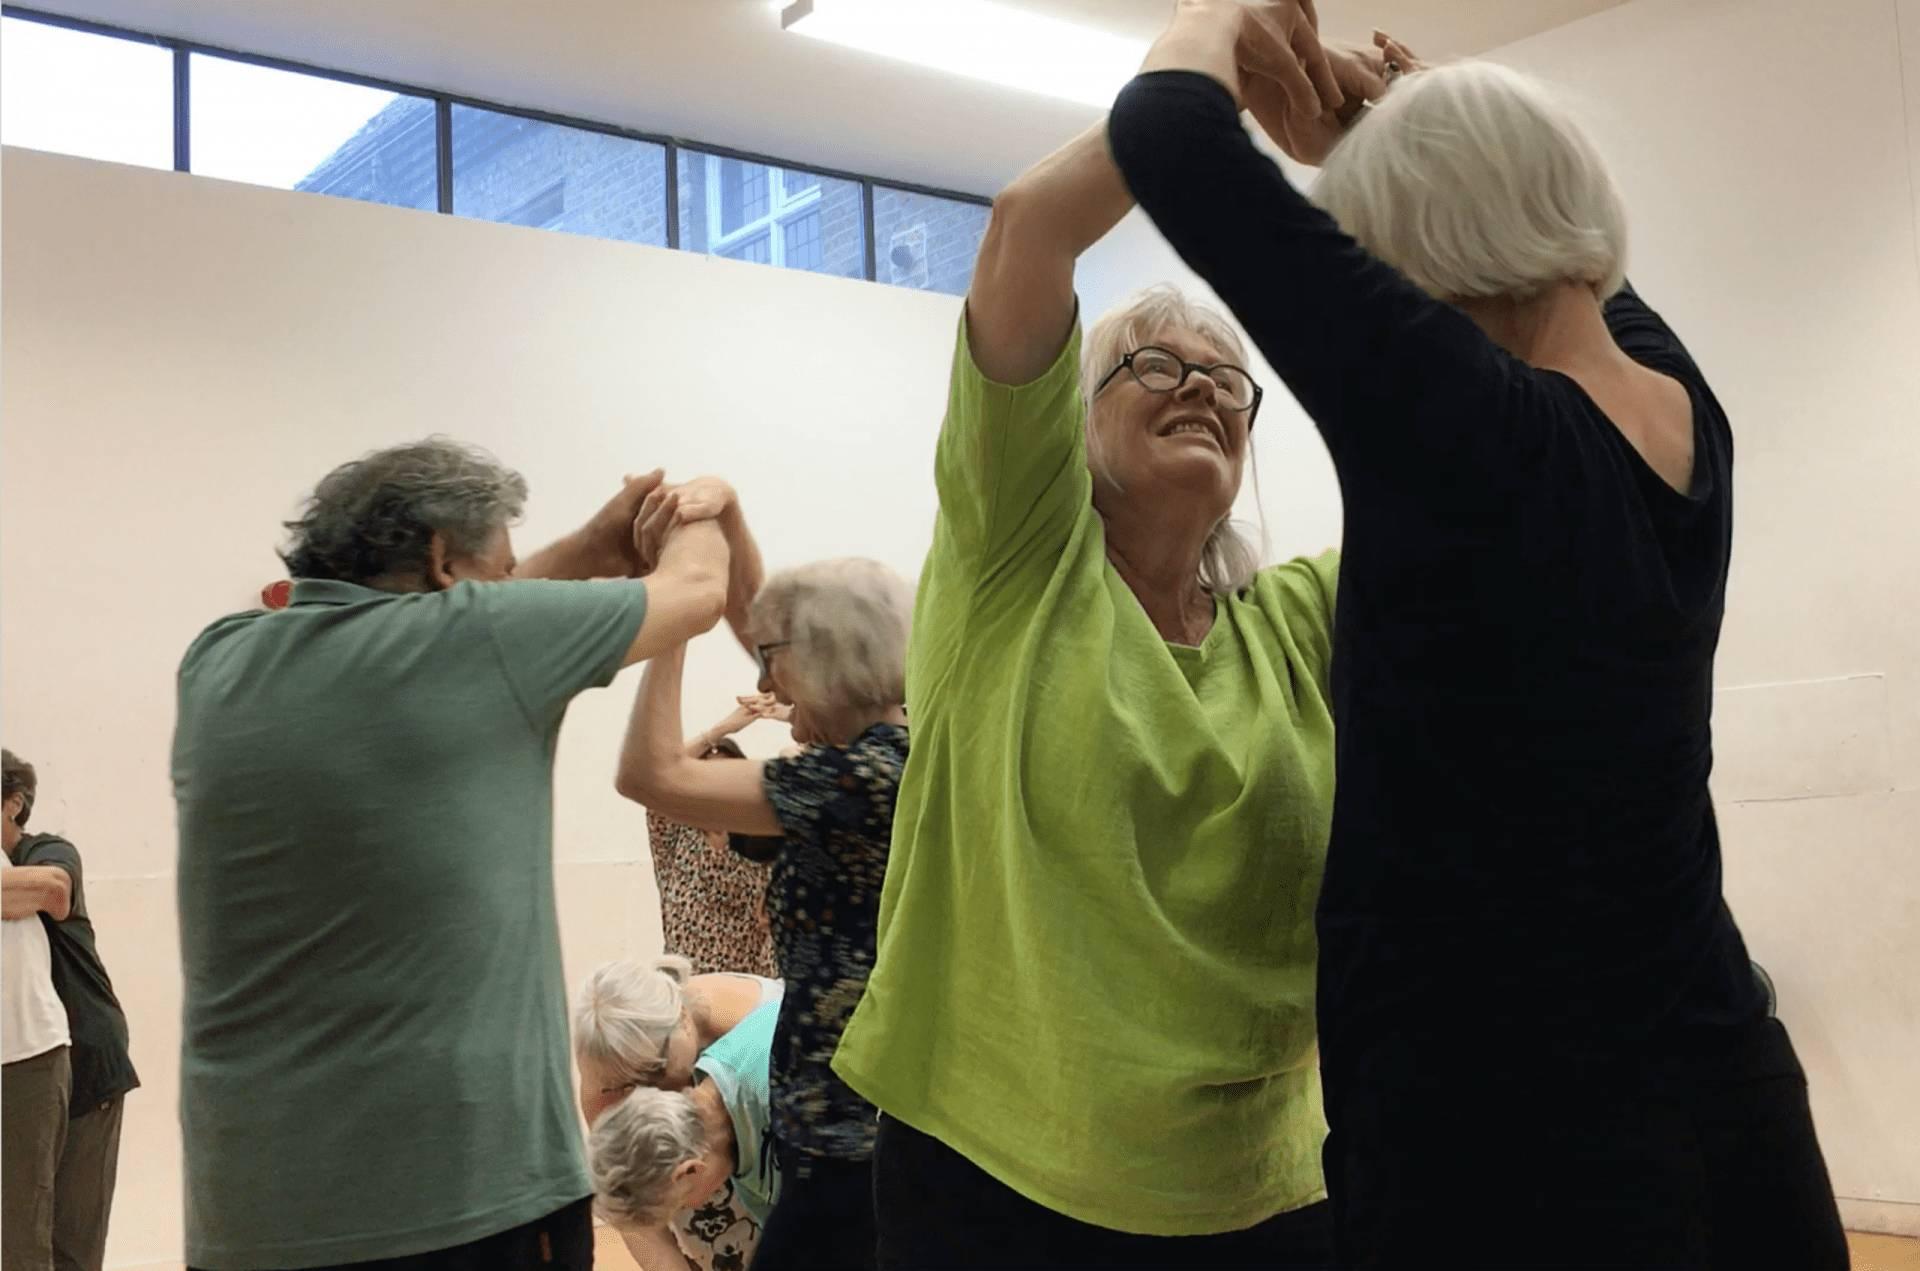 Fluid Boundaries – community contemporary dance performances responding to architectural landmarks.